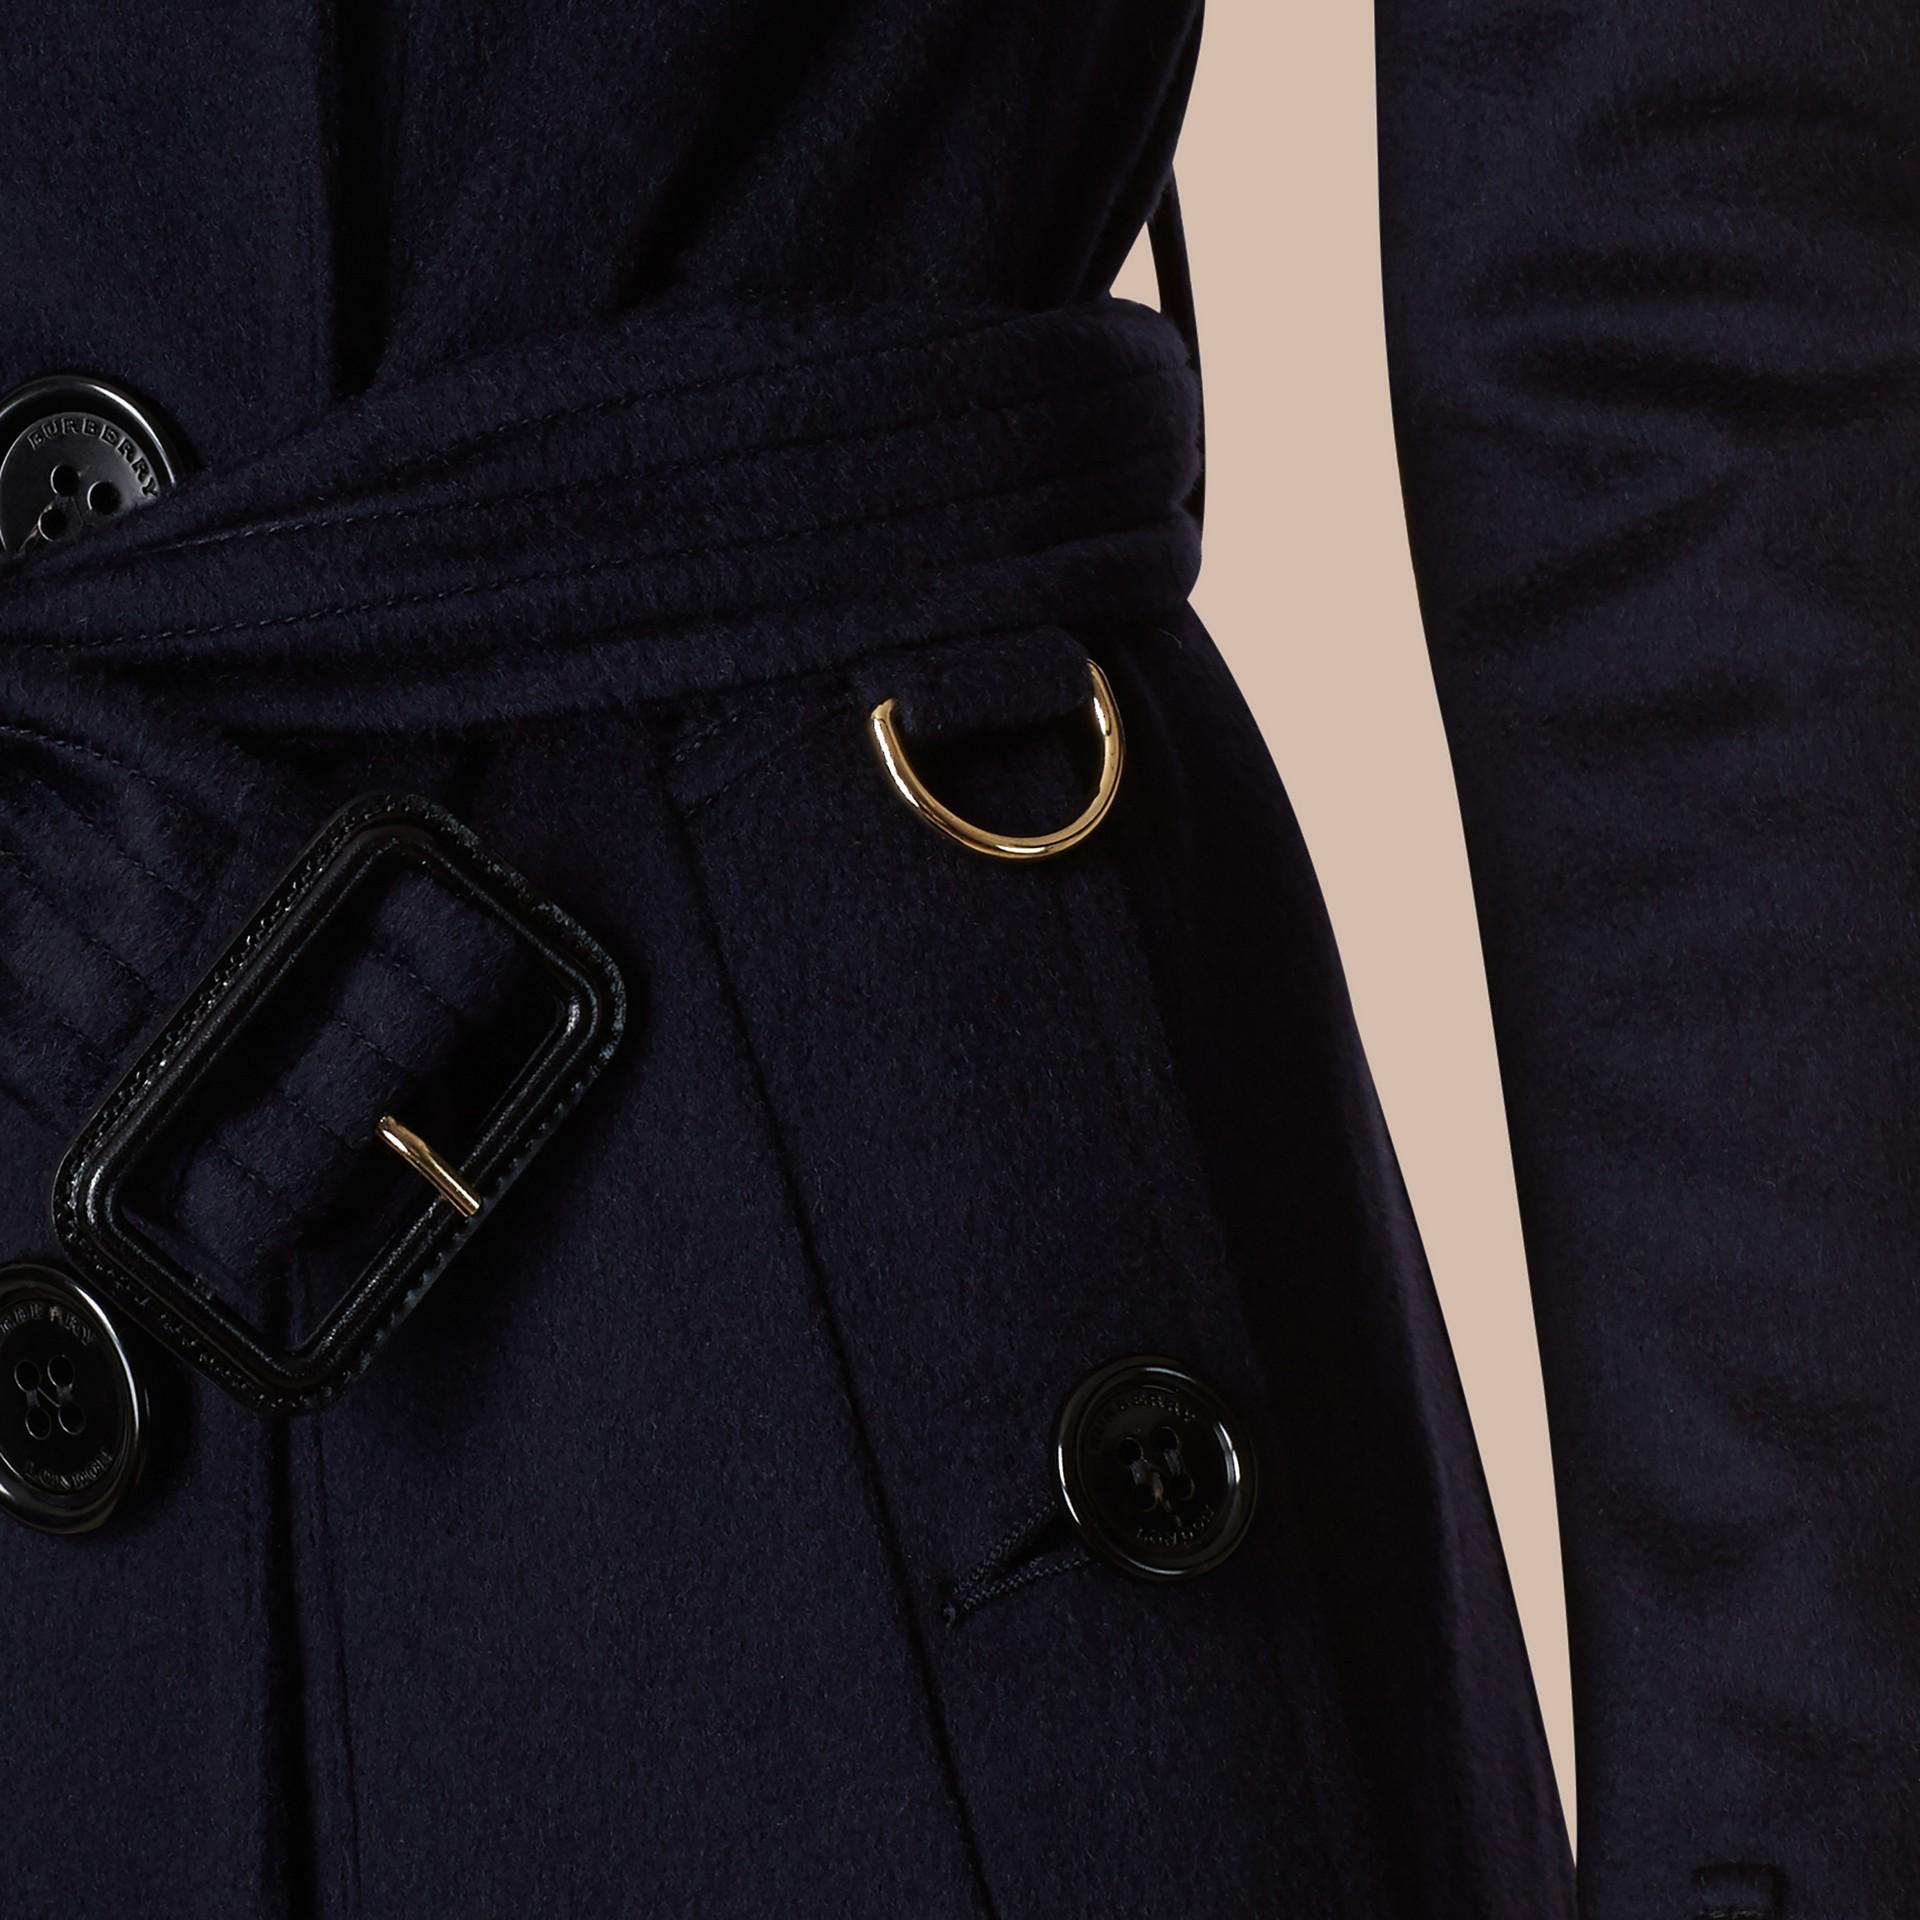 Indigo Sandringham Fit Cashmere Trench Coat Indigo - gallery image 6